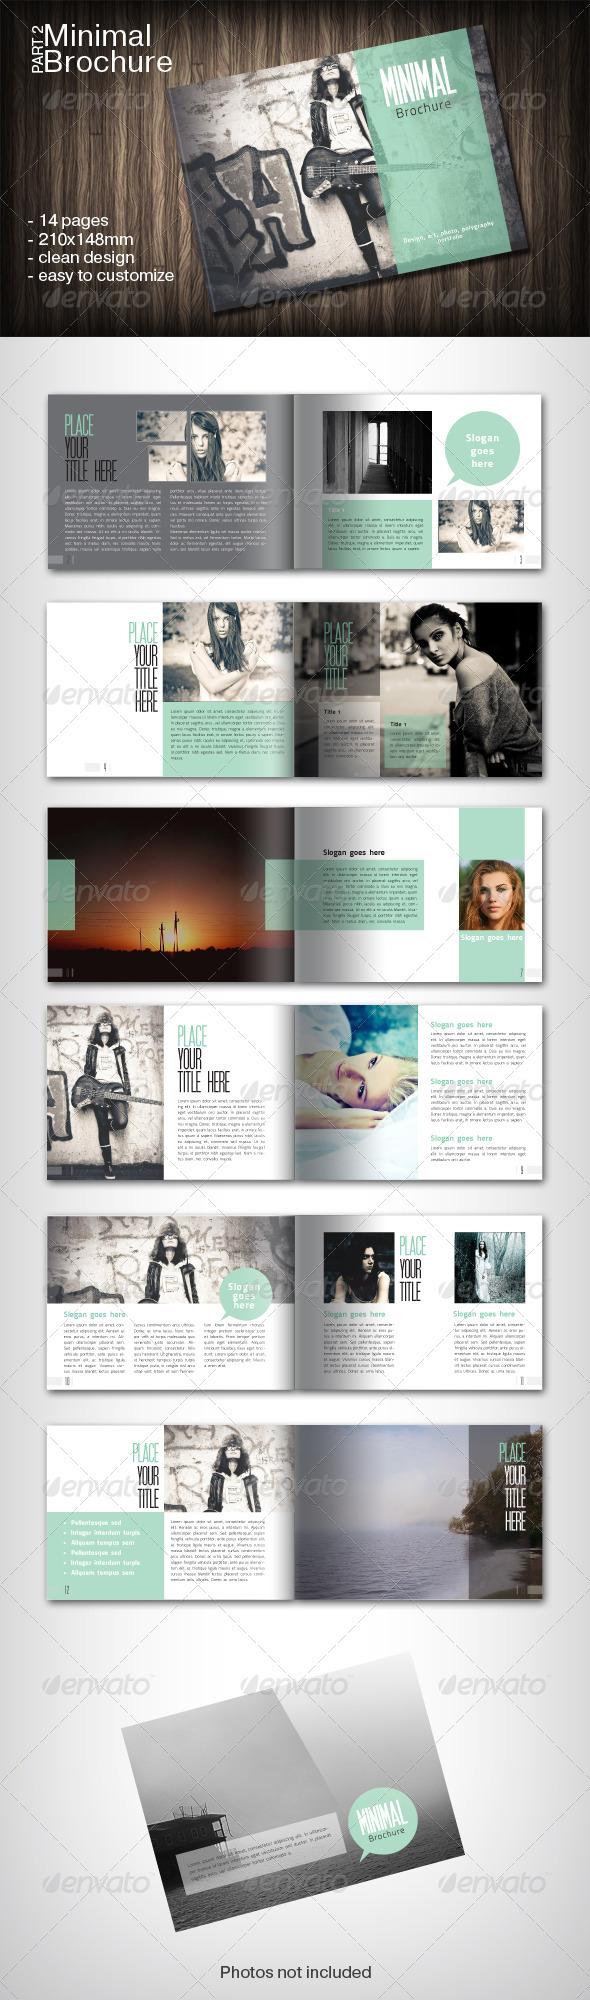 Minimal Brochure Part 2 - Brochures Print Templates